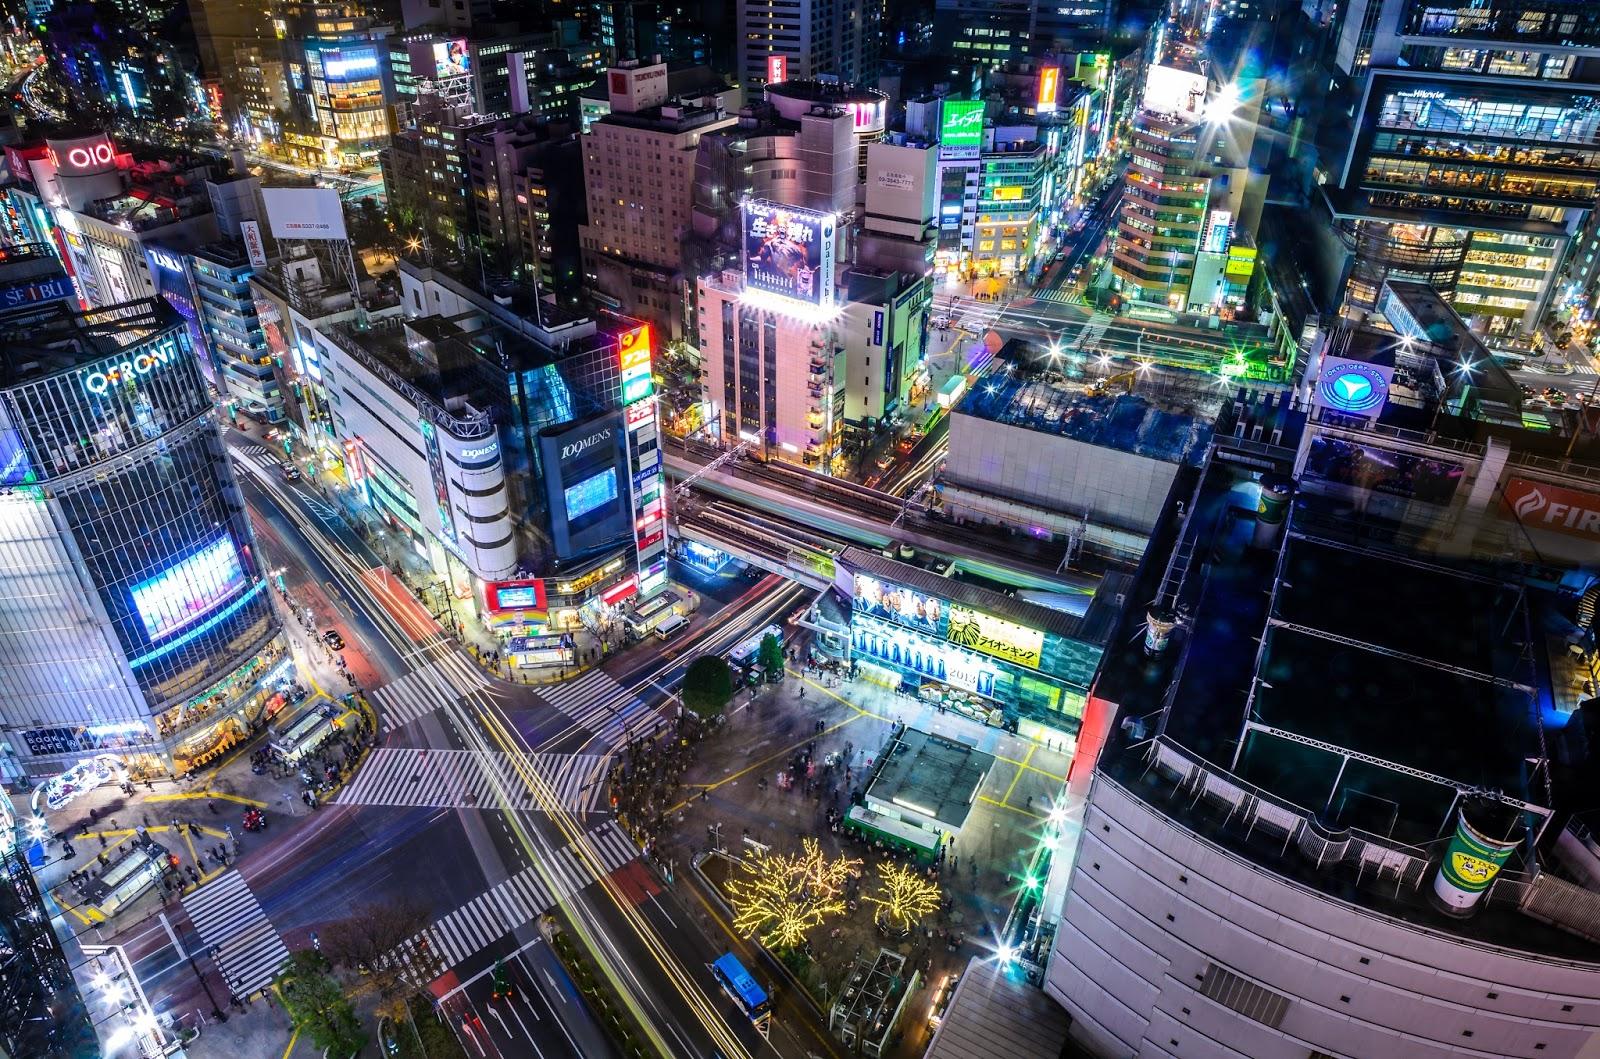 http://hsmithphotography.smugmug.com/LandScapes/Japan/i-MswFM5x/A